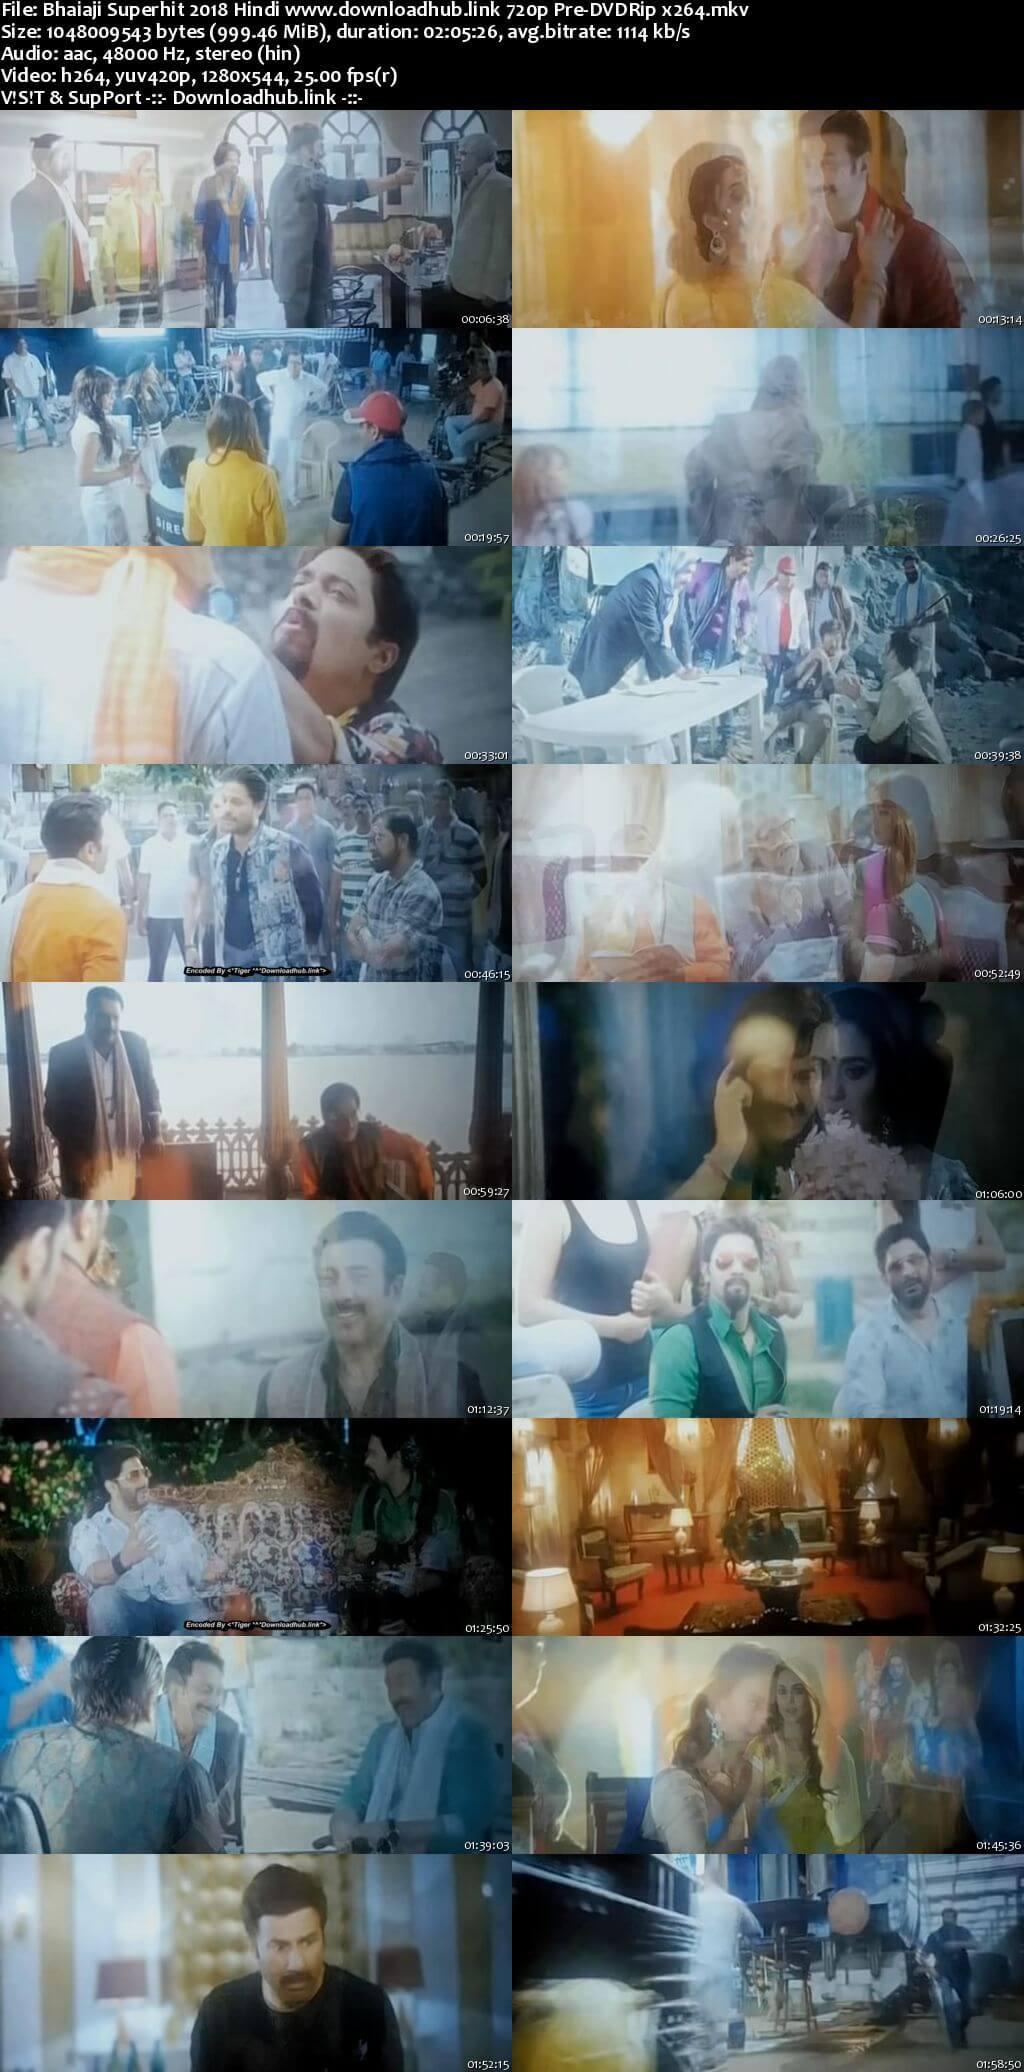 Bhaiaji Superhit 2018 Hindi 720p Pre-DVDRip x264